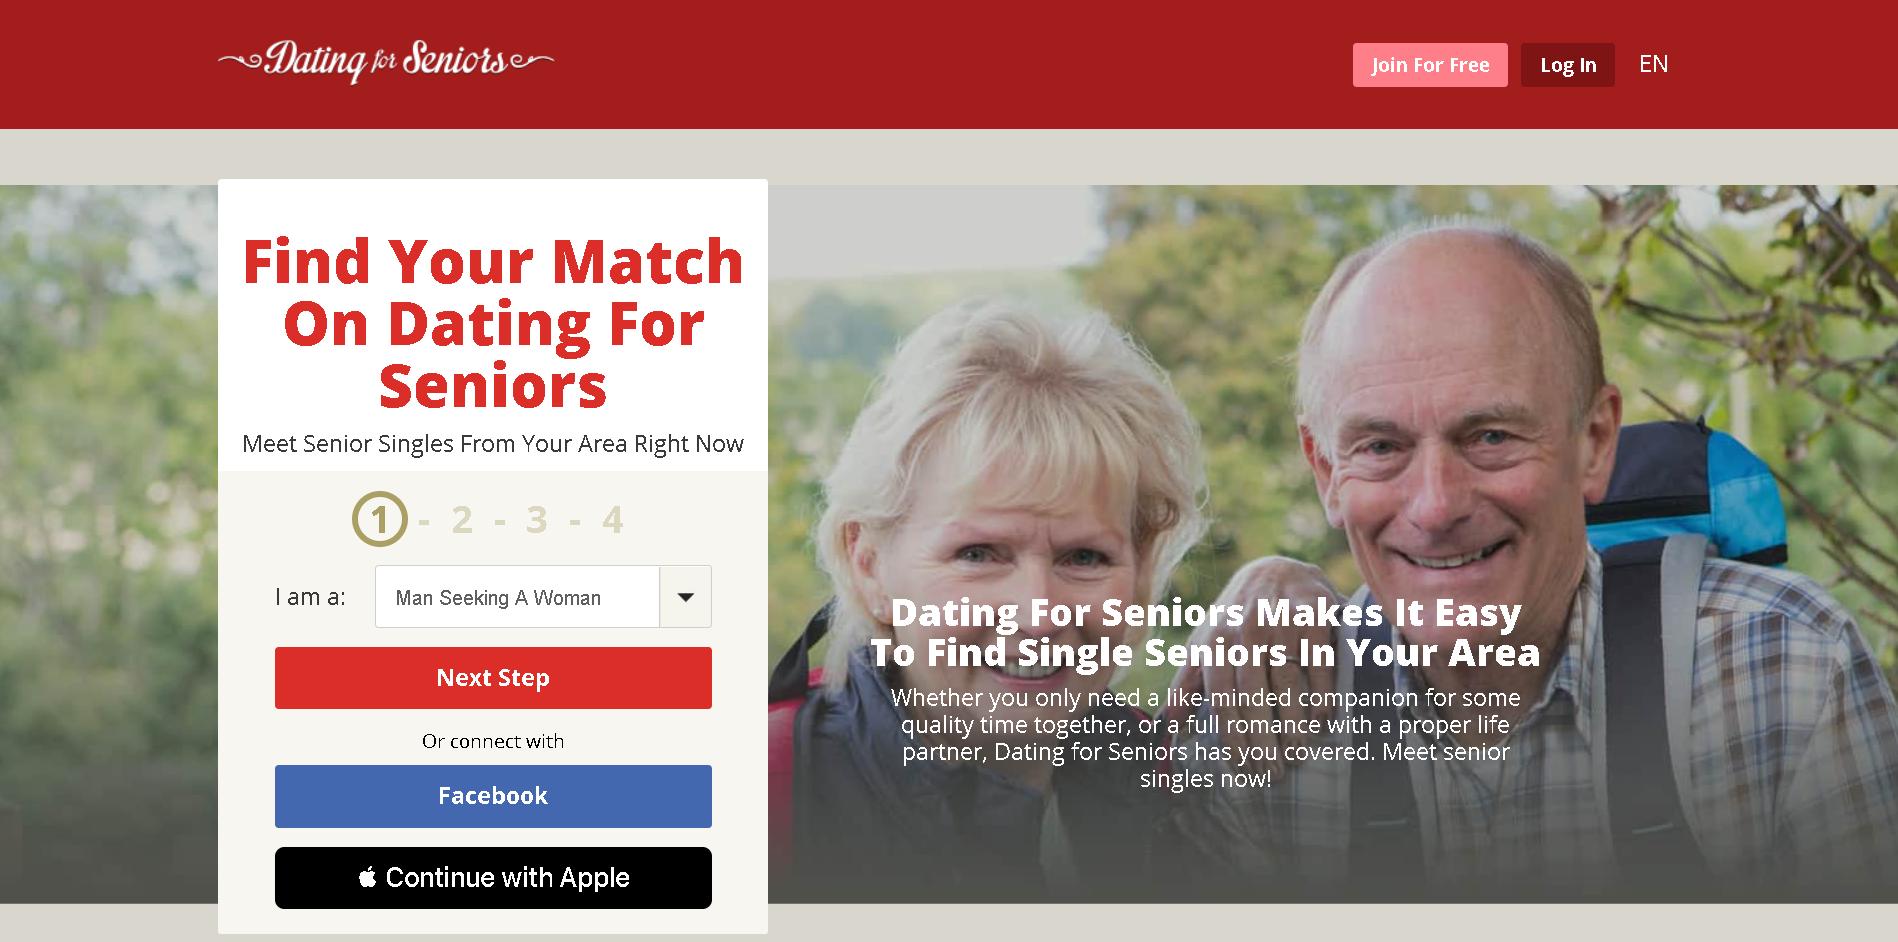 DatingforSeniors.com Image